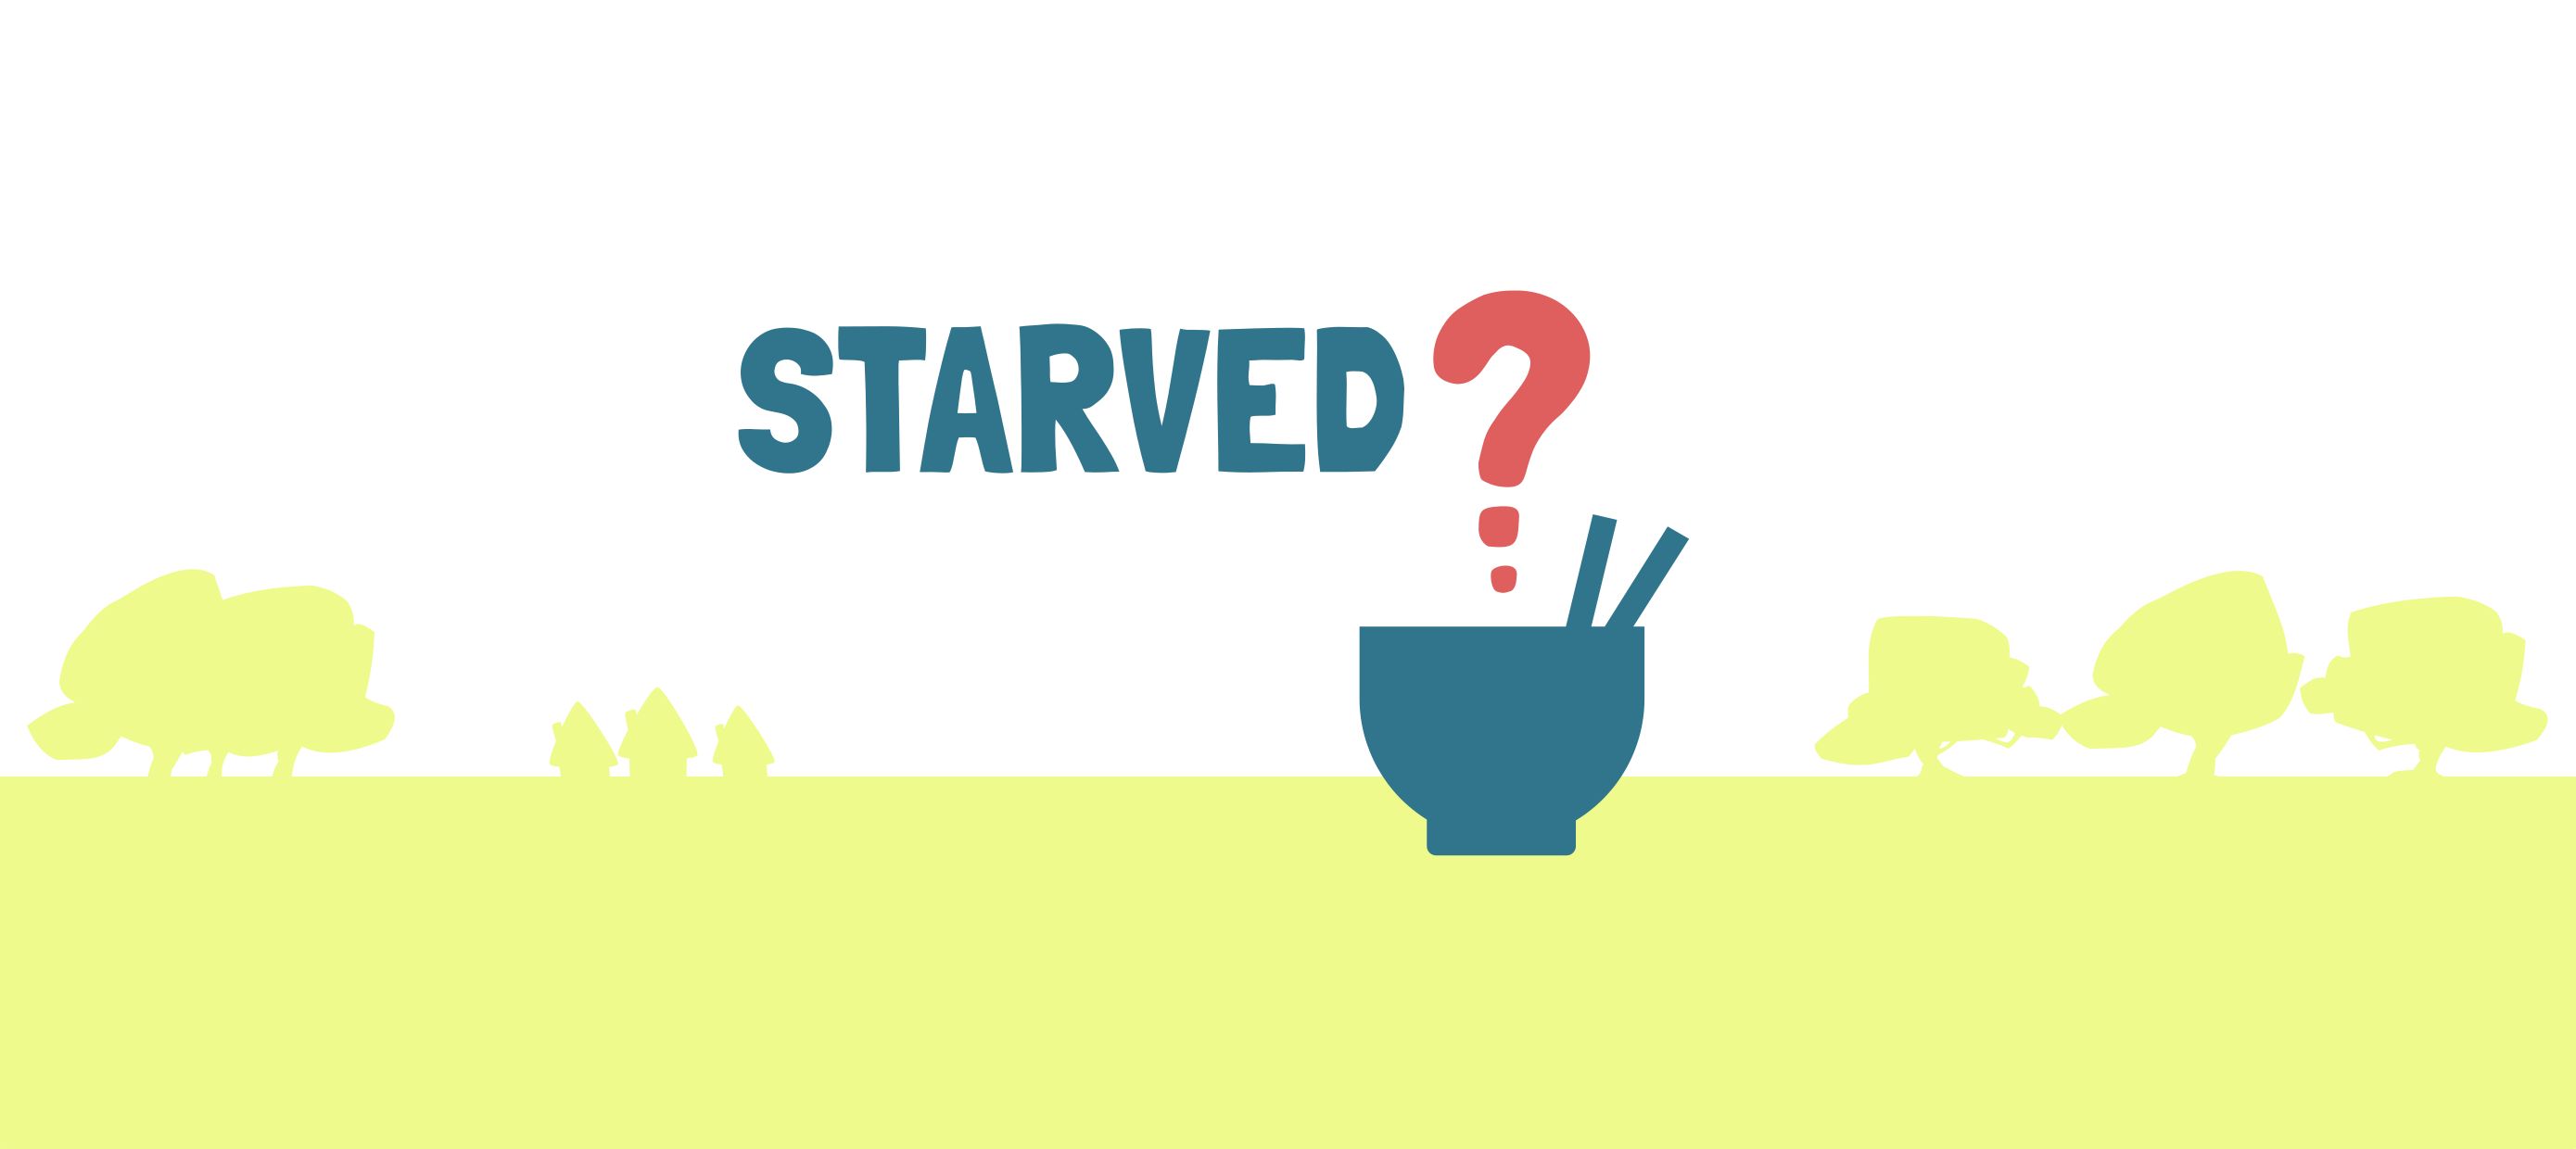 Starved?